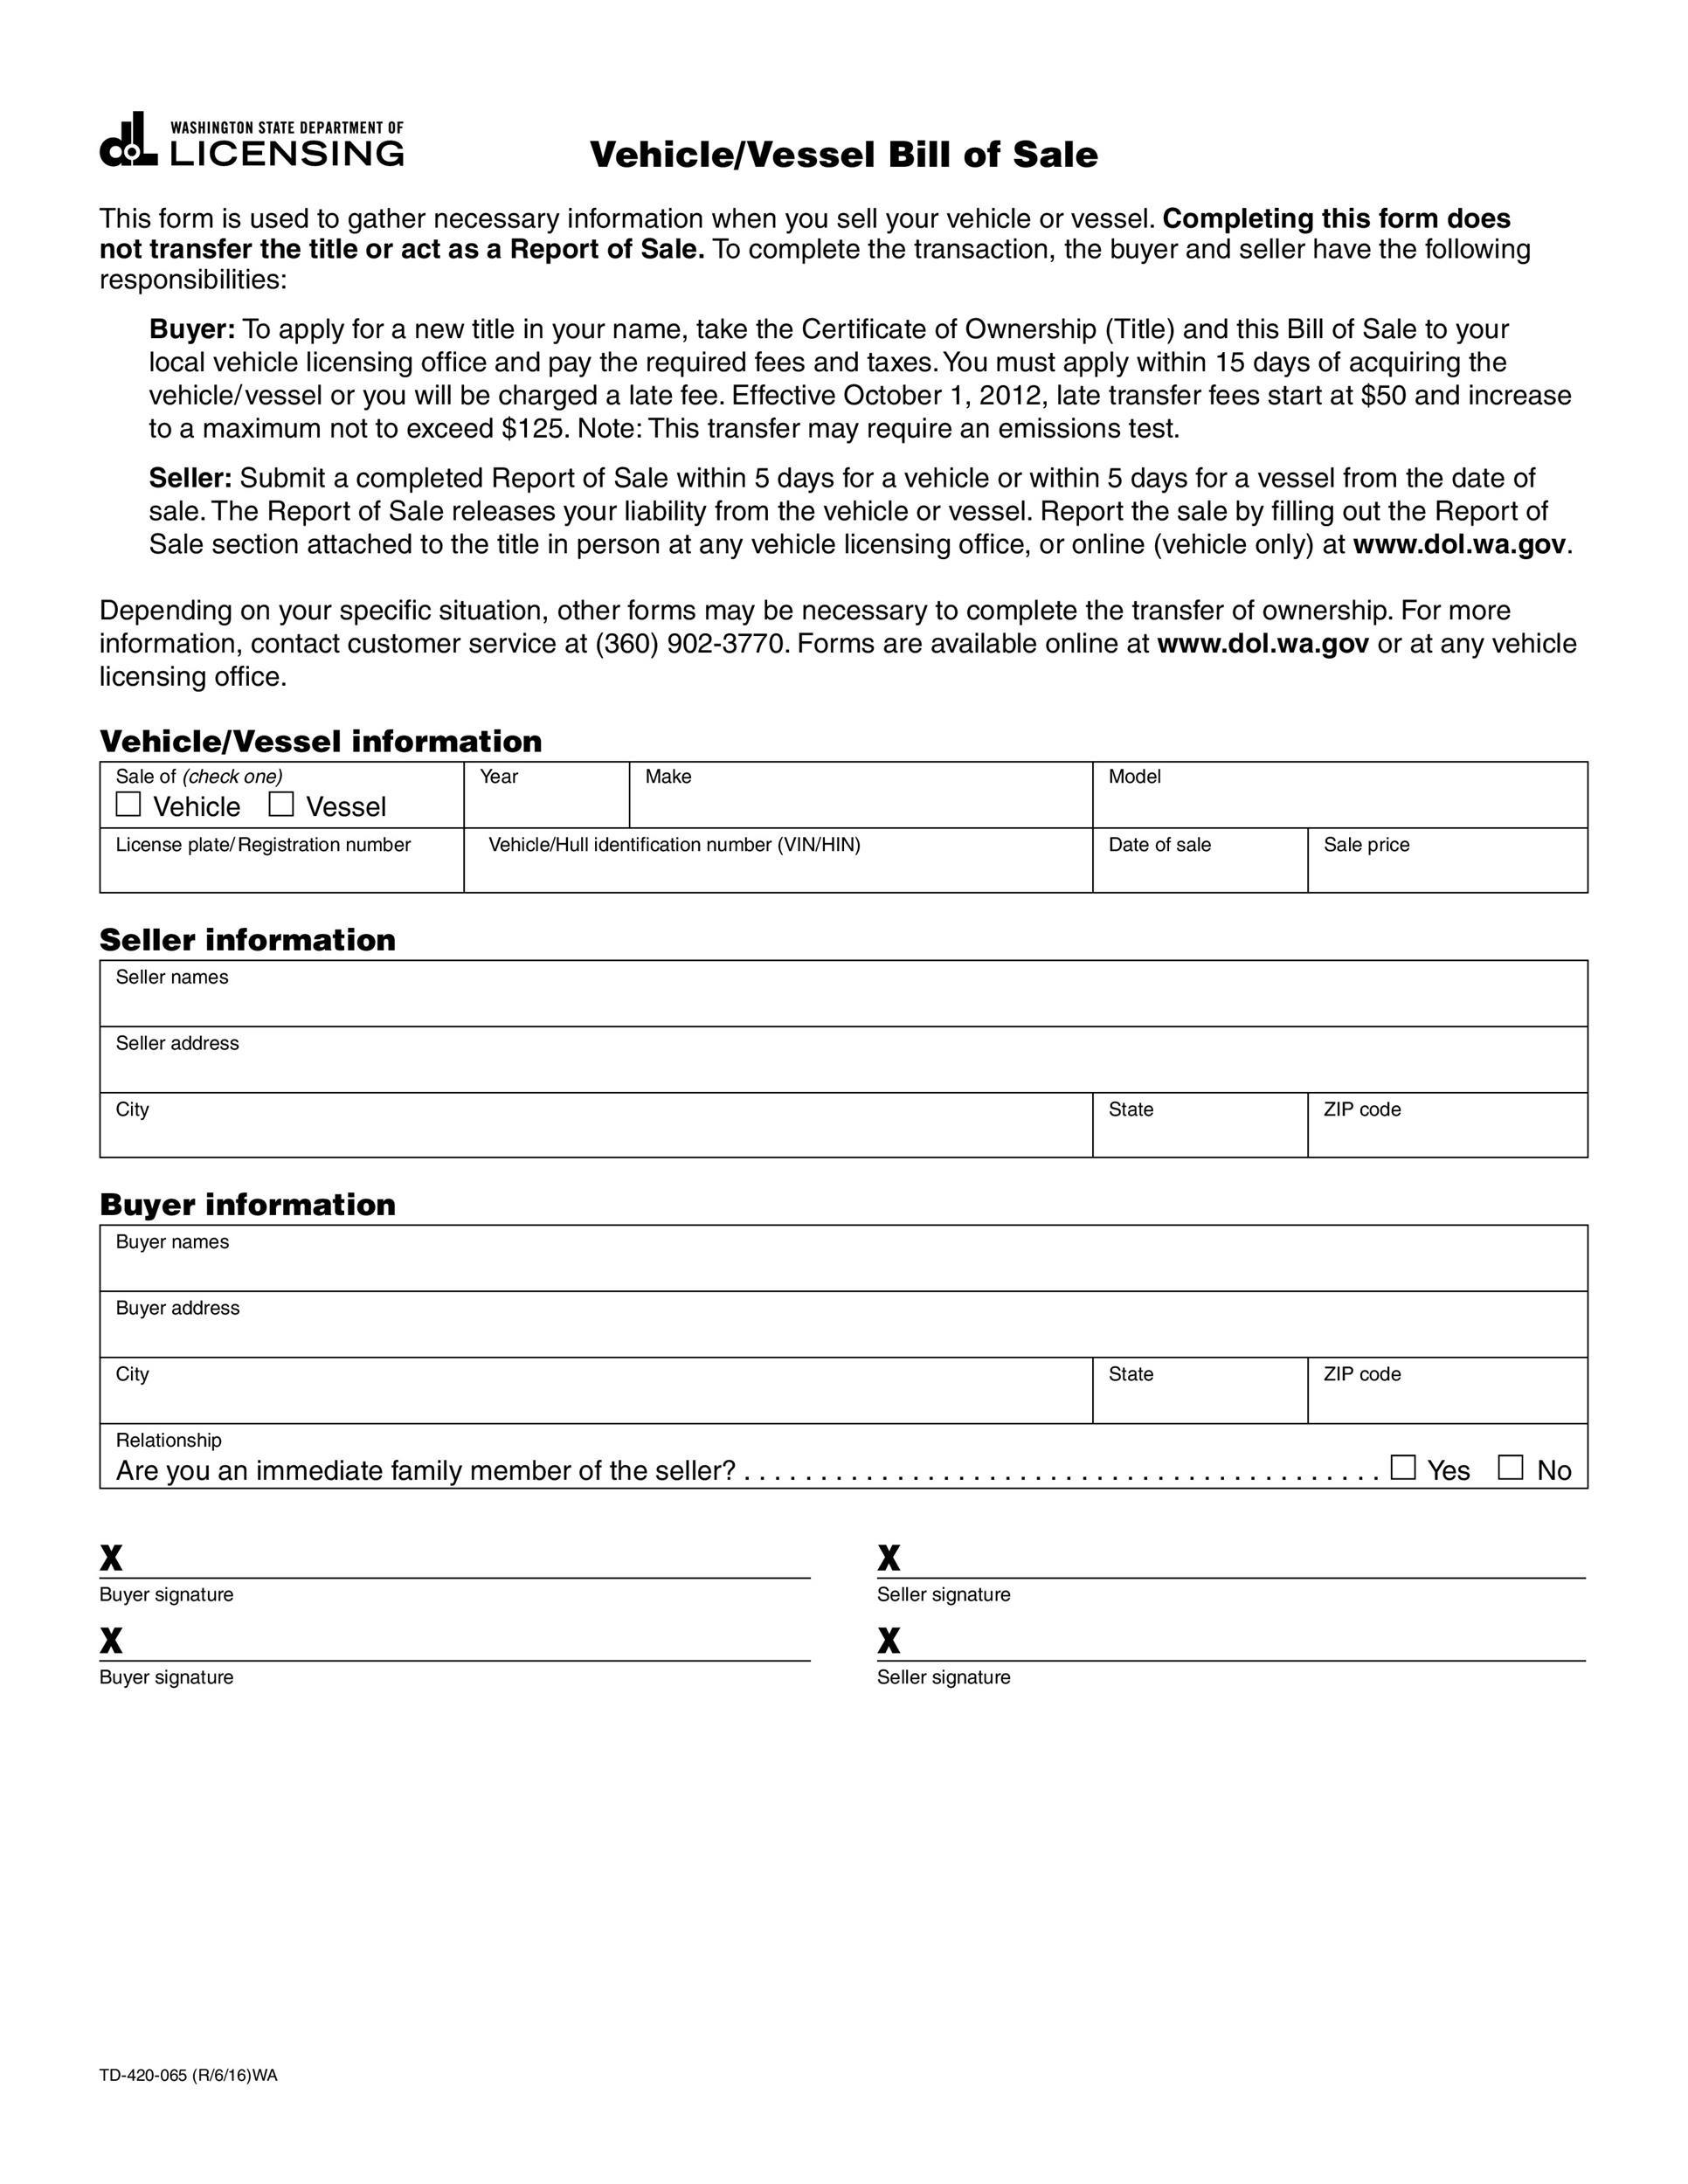 45 fee printable bill of sale templates car boat gun vehicle template lab. Black Bedroom Furniture Sets. Home Design Ideas